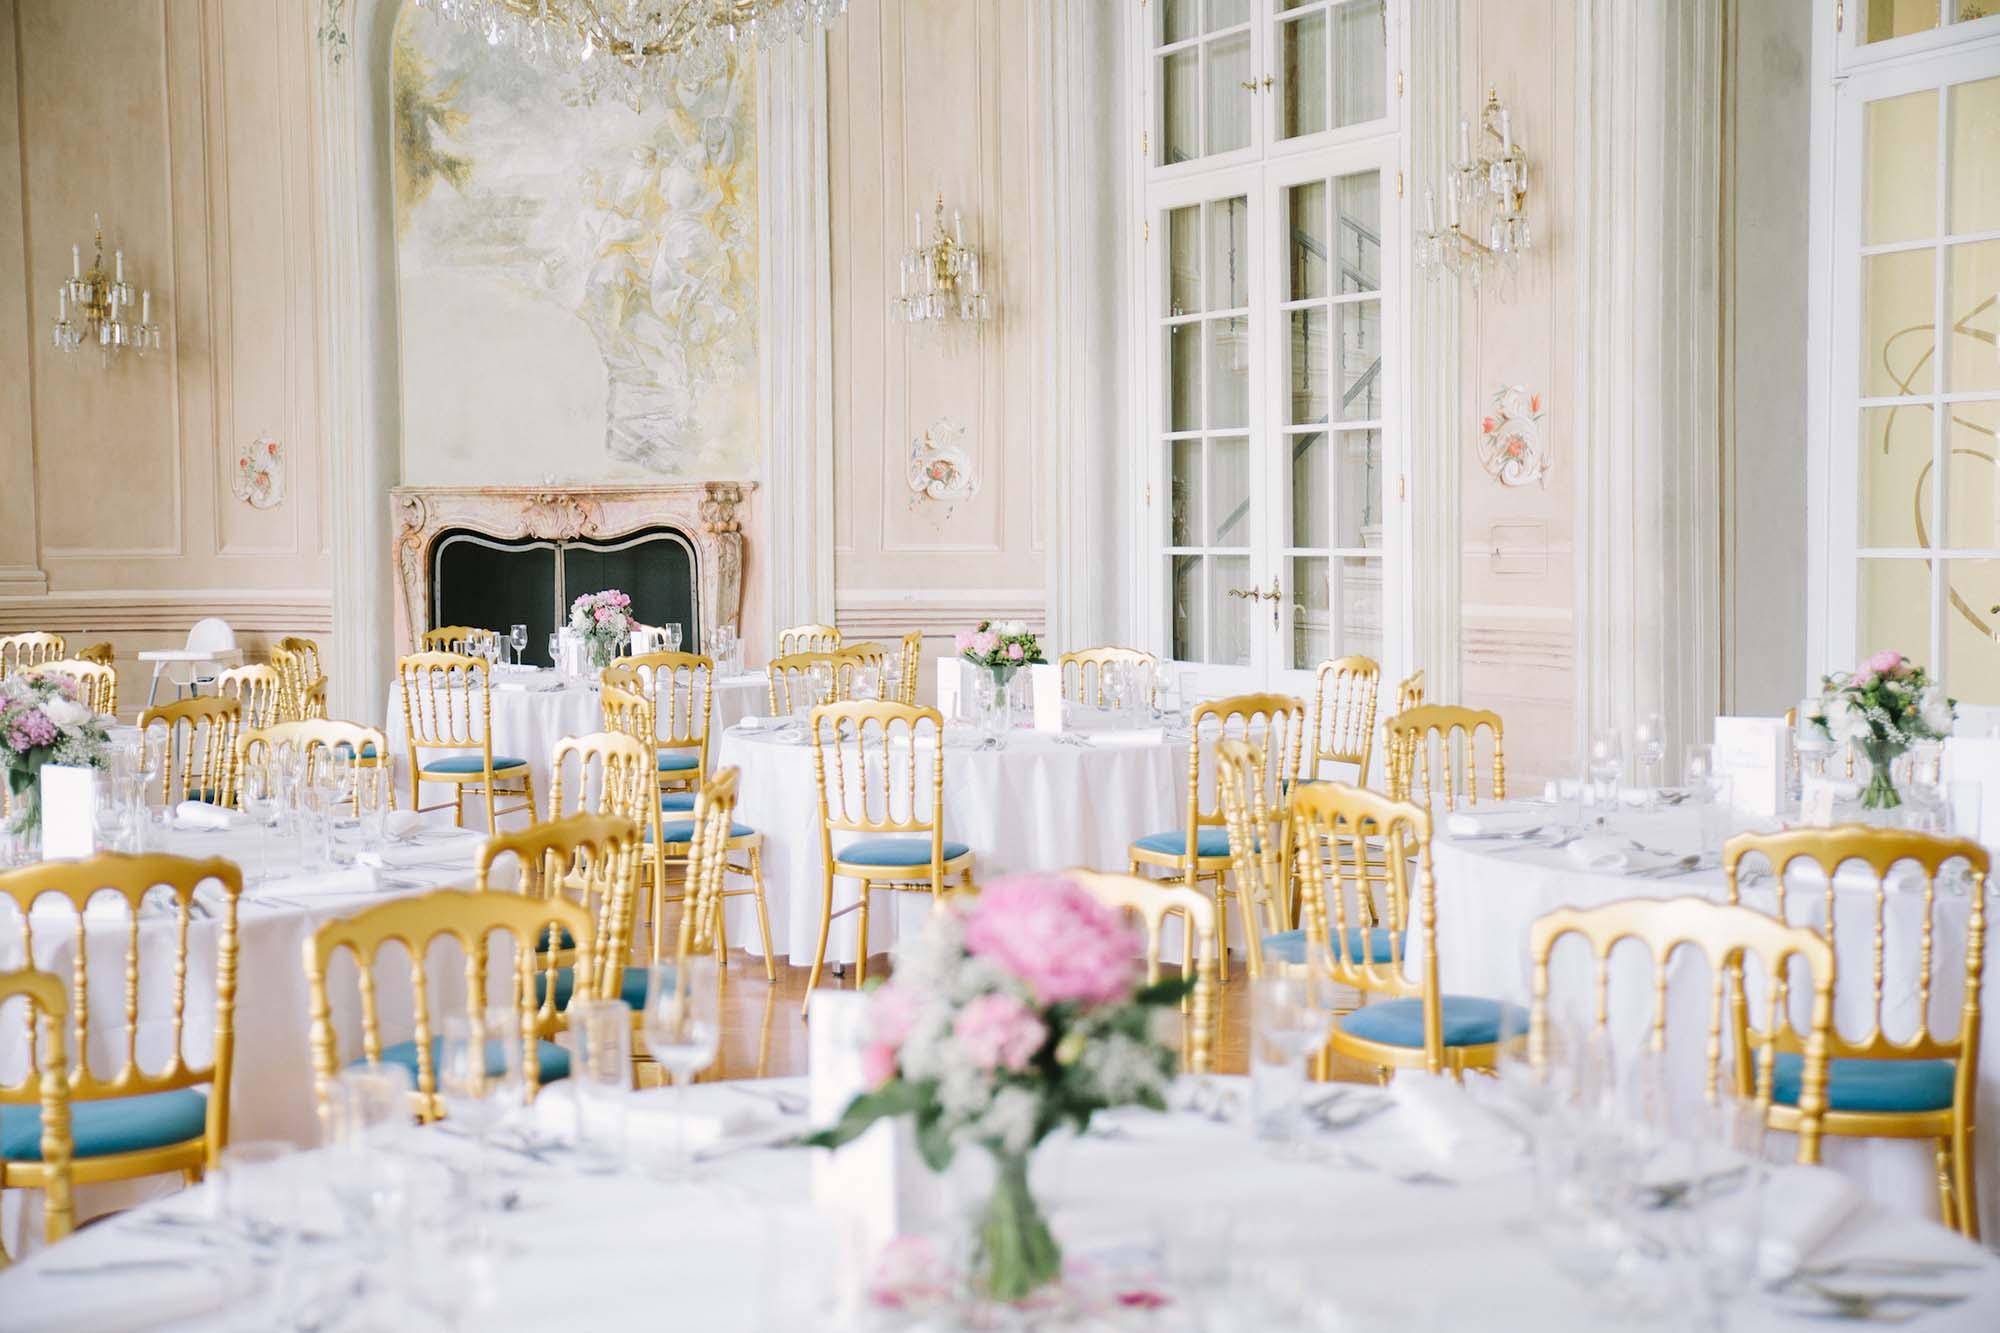 Hochzeitsplanerin Ledi Zoto